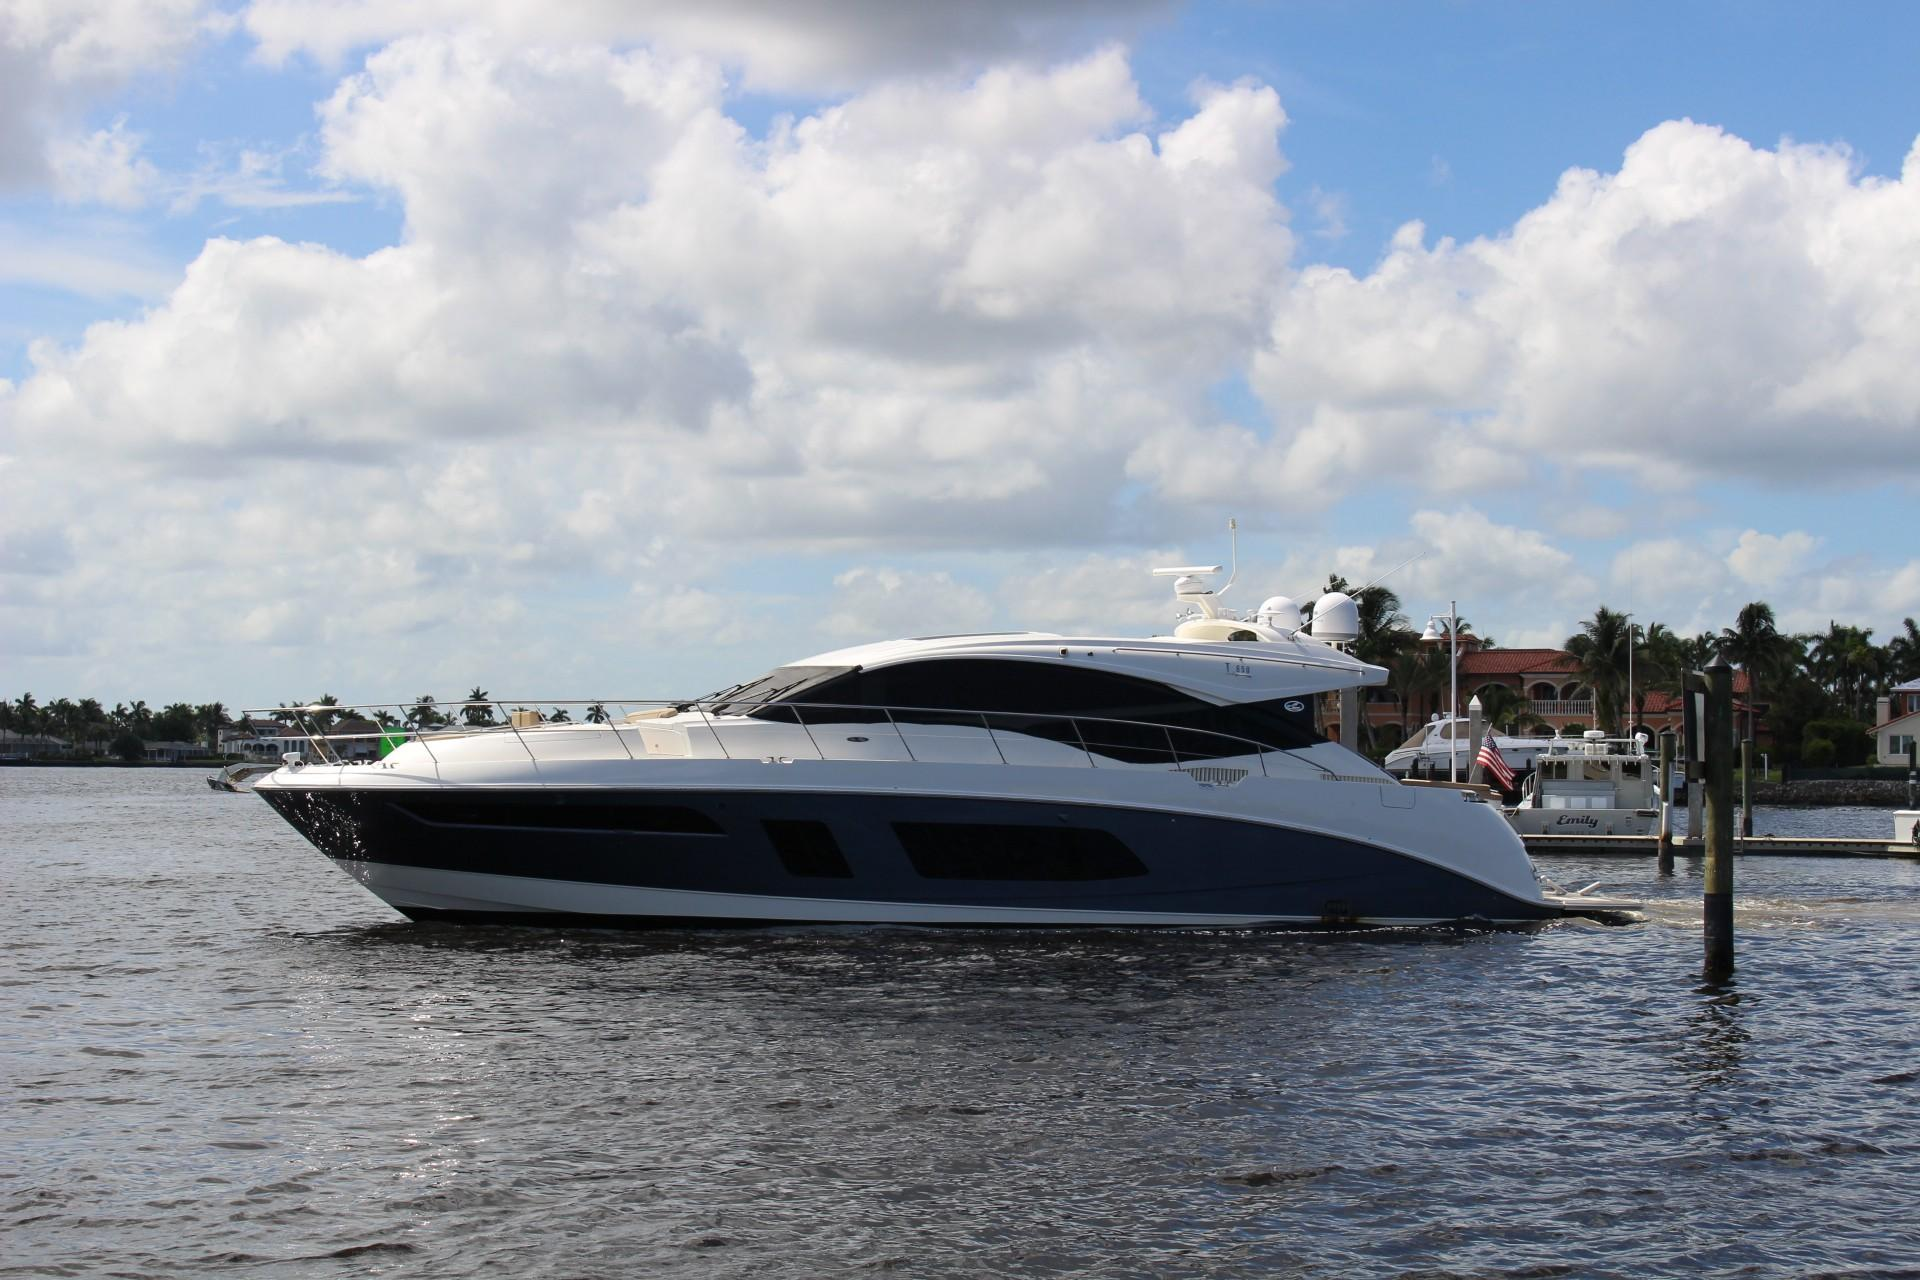 65 ft Sea Ray L650 Express